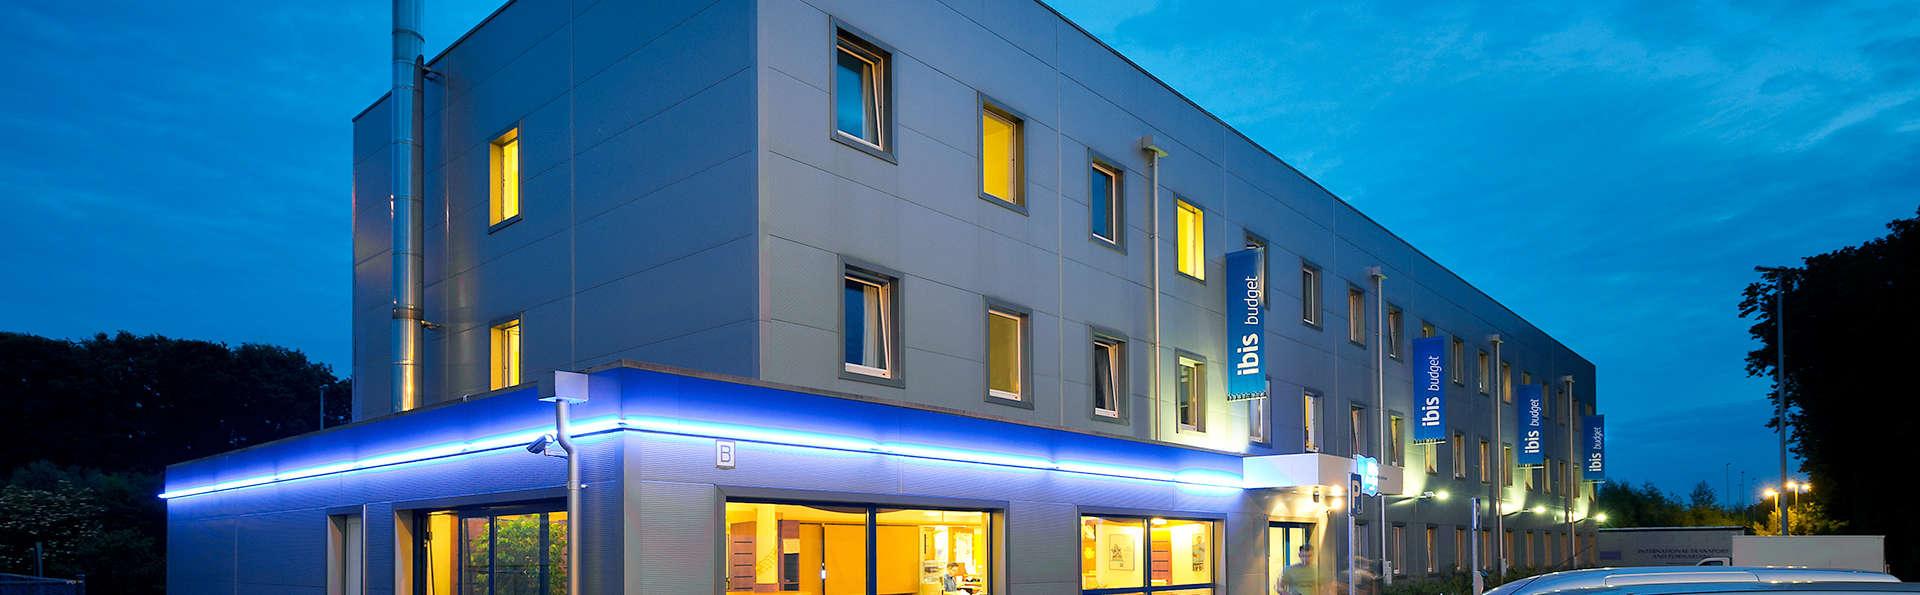 Hotel ibis budget Aachen Raeren Grenze - Edit_Front2.jpg